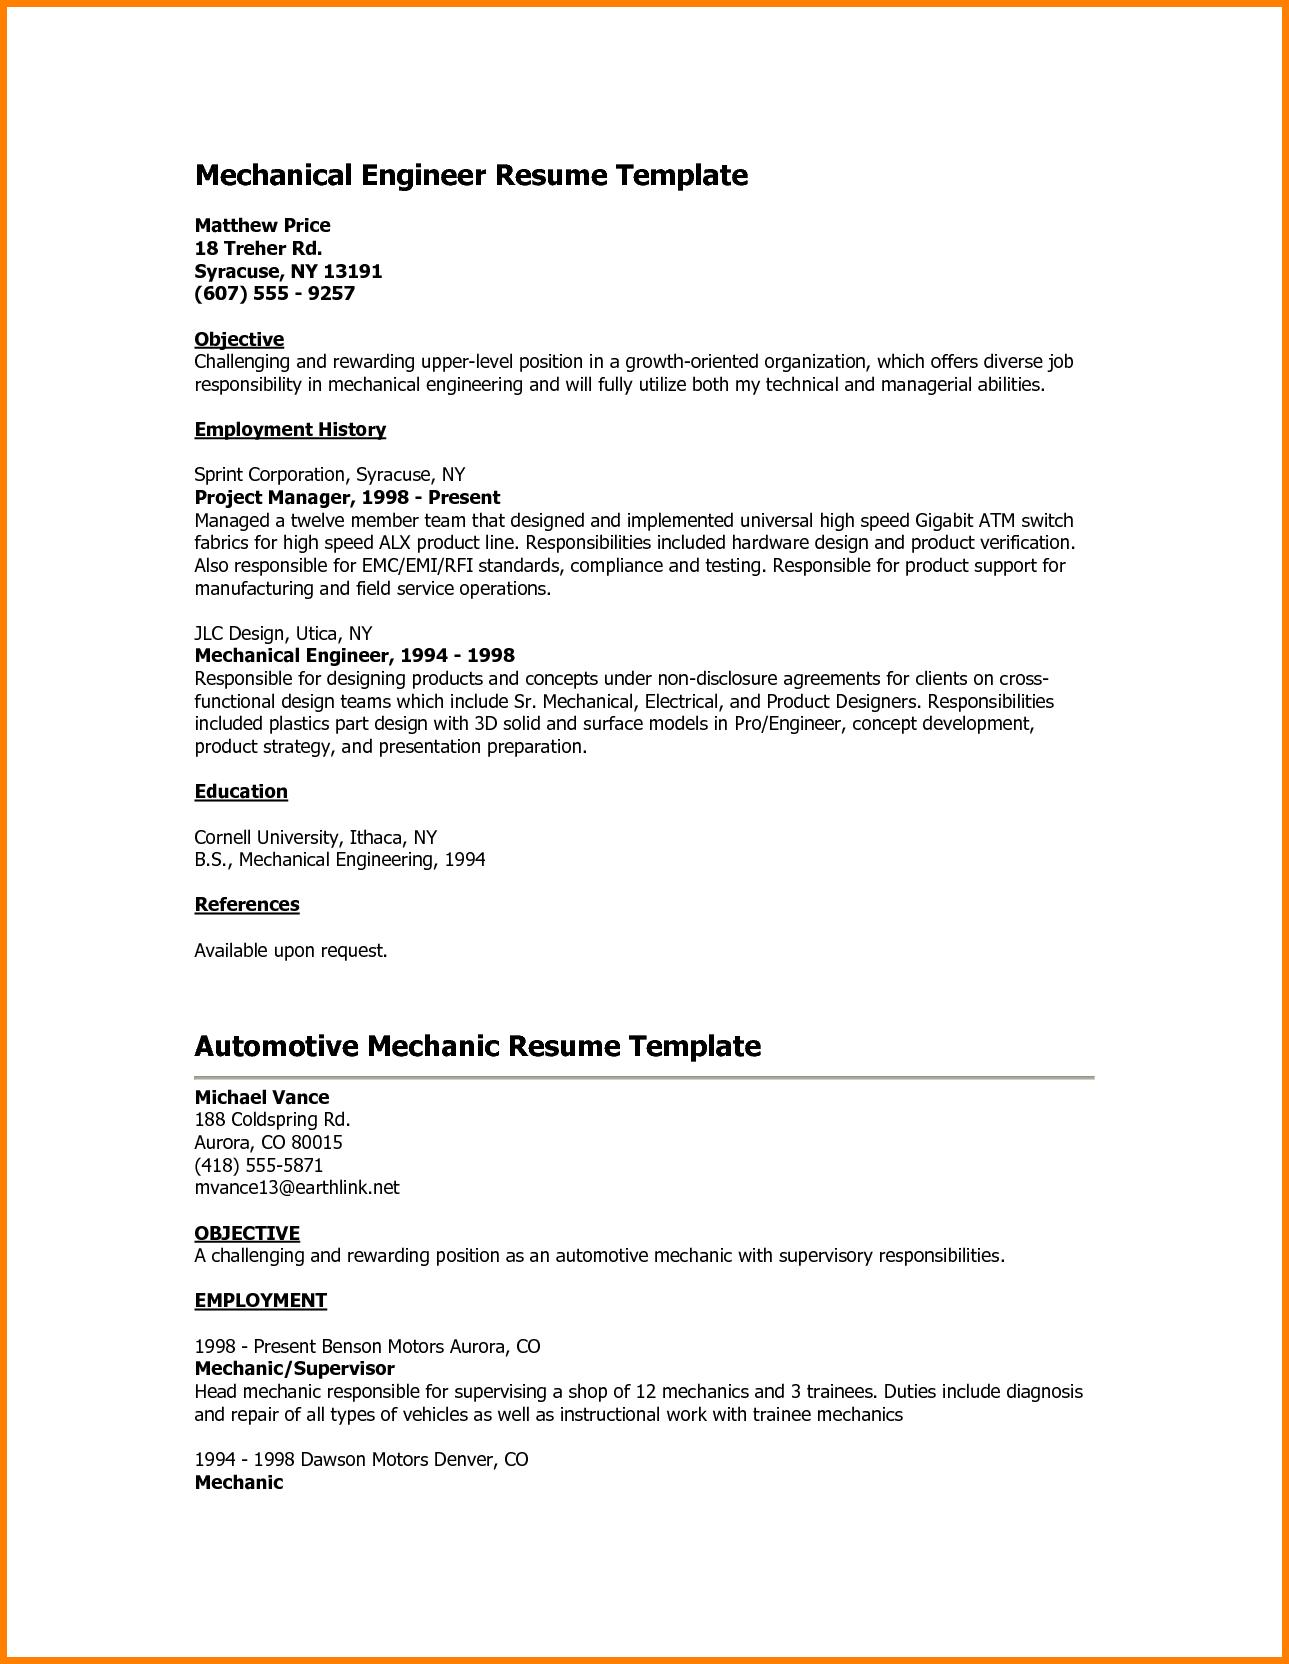 Mechanical Engineer Resume Objective Examples Sidemcicek Com Mechanical Engineer Resume Engineering Resume Bank Teller Resume